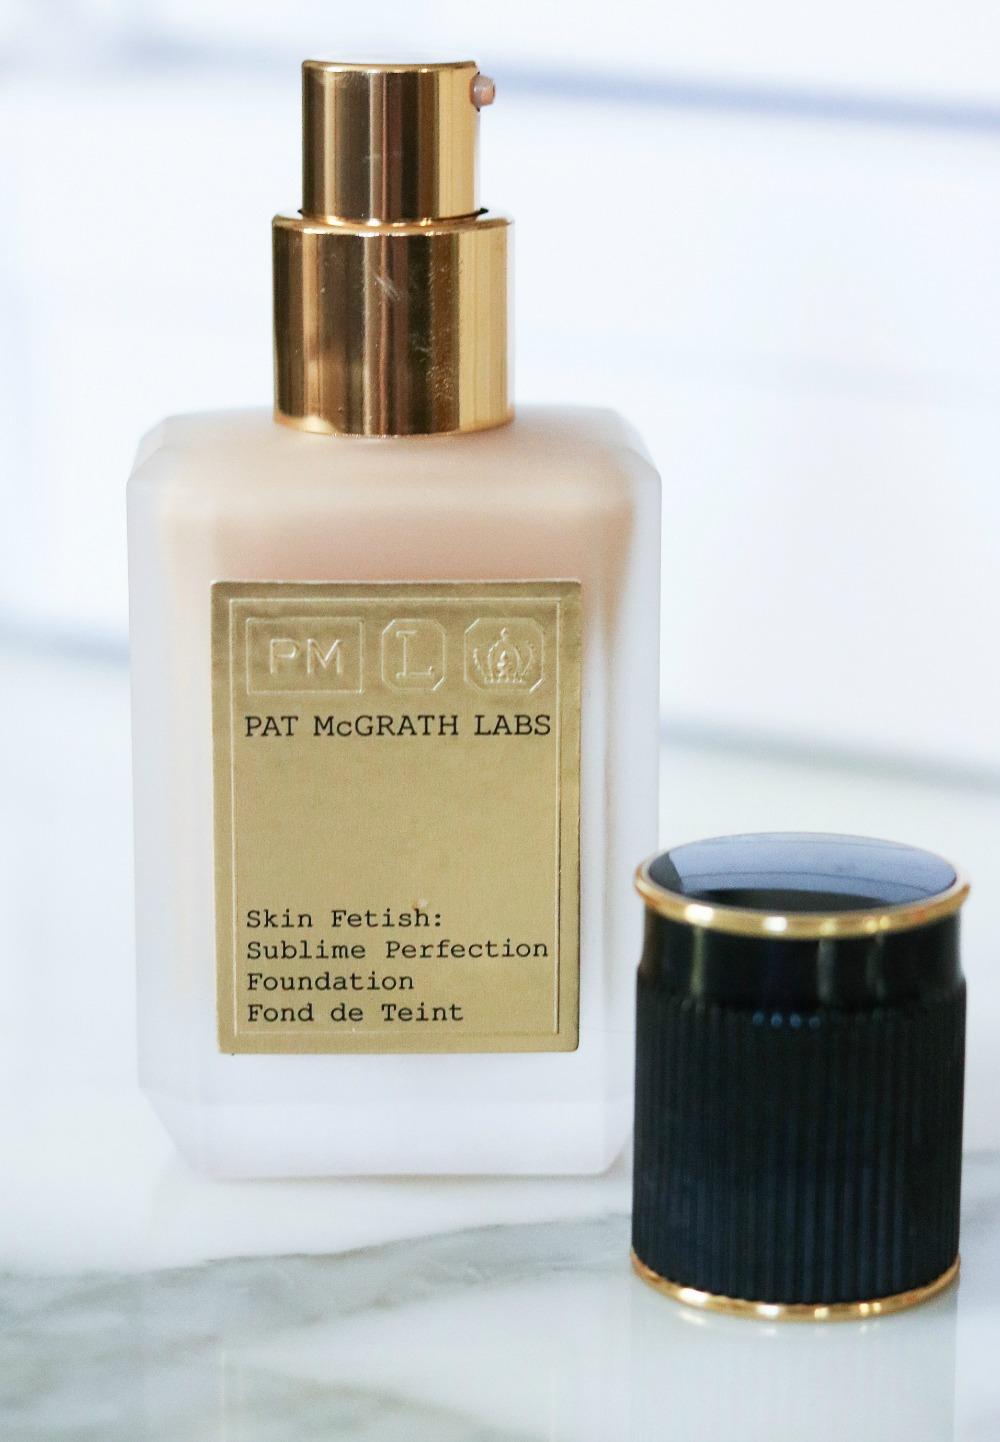 Pat McGrath Sublime Perfection Foundation Review I Luxury Makeup Blog DreaminLace.com #Makeup #BeautyTips #BeautyBlog